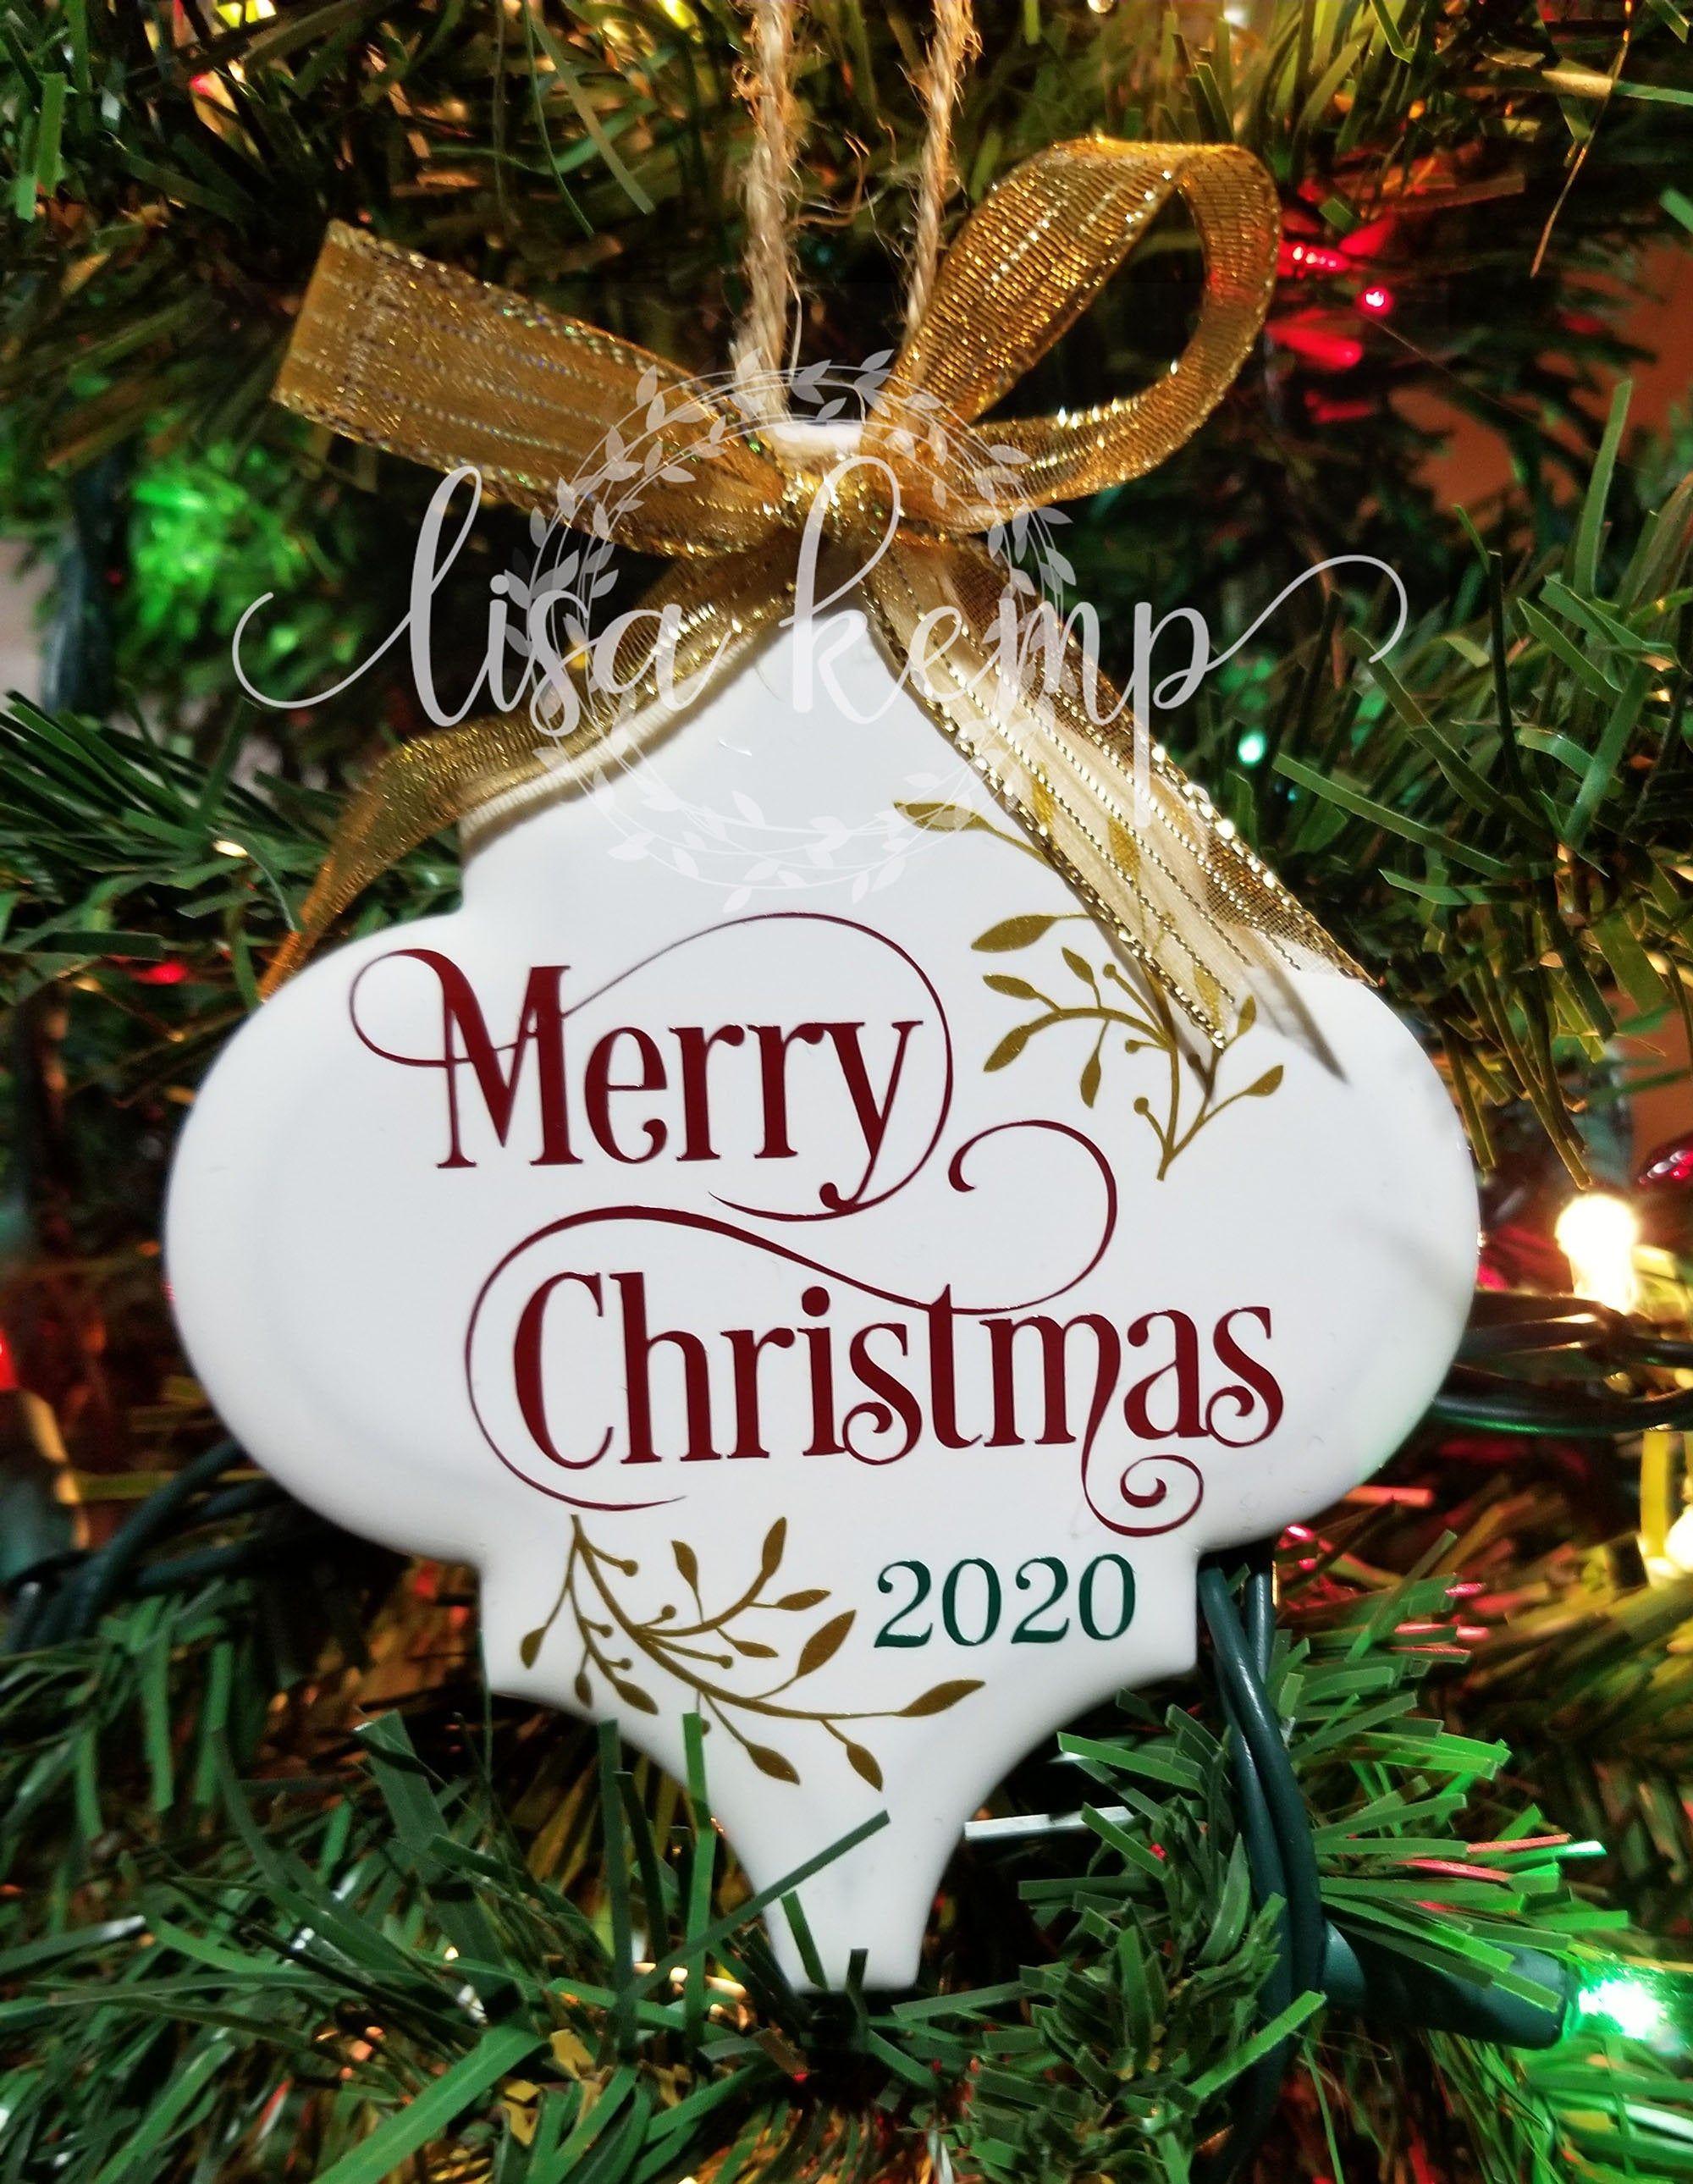 Merry Christmas Ceramic Lantern Tile Ornament Etsy In 2021 Vinyl Christmas Ornaments Christmas Ornament Crafts Unique Christmas Ornaments